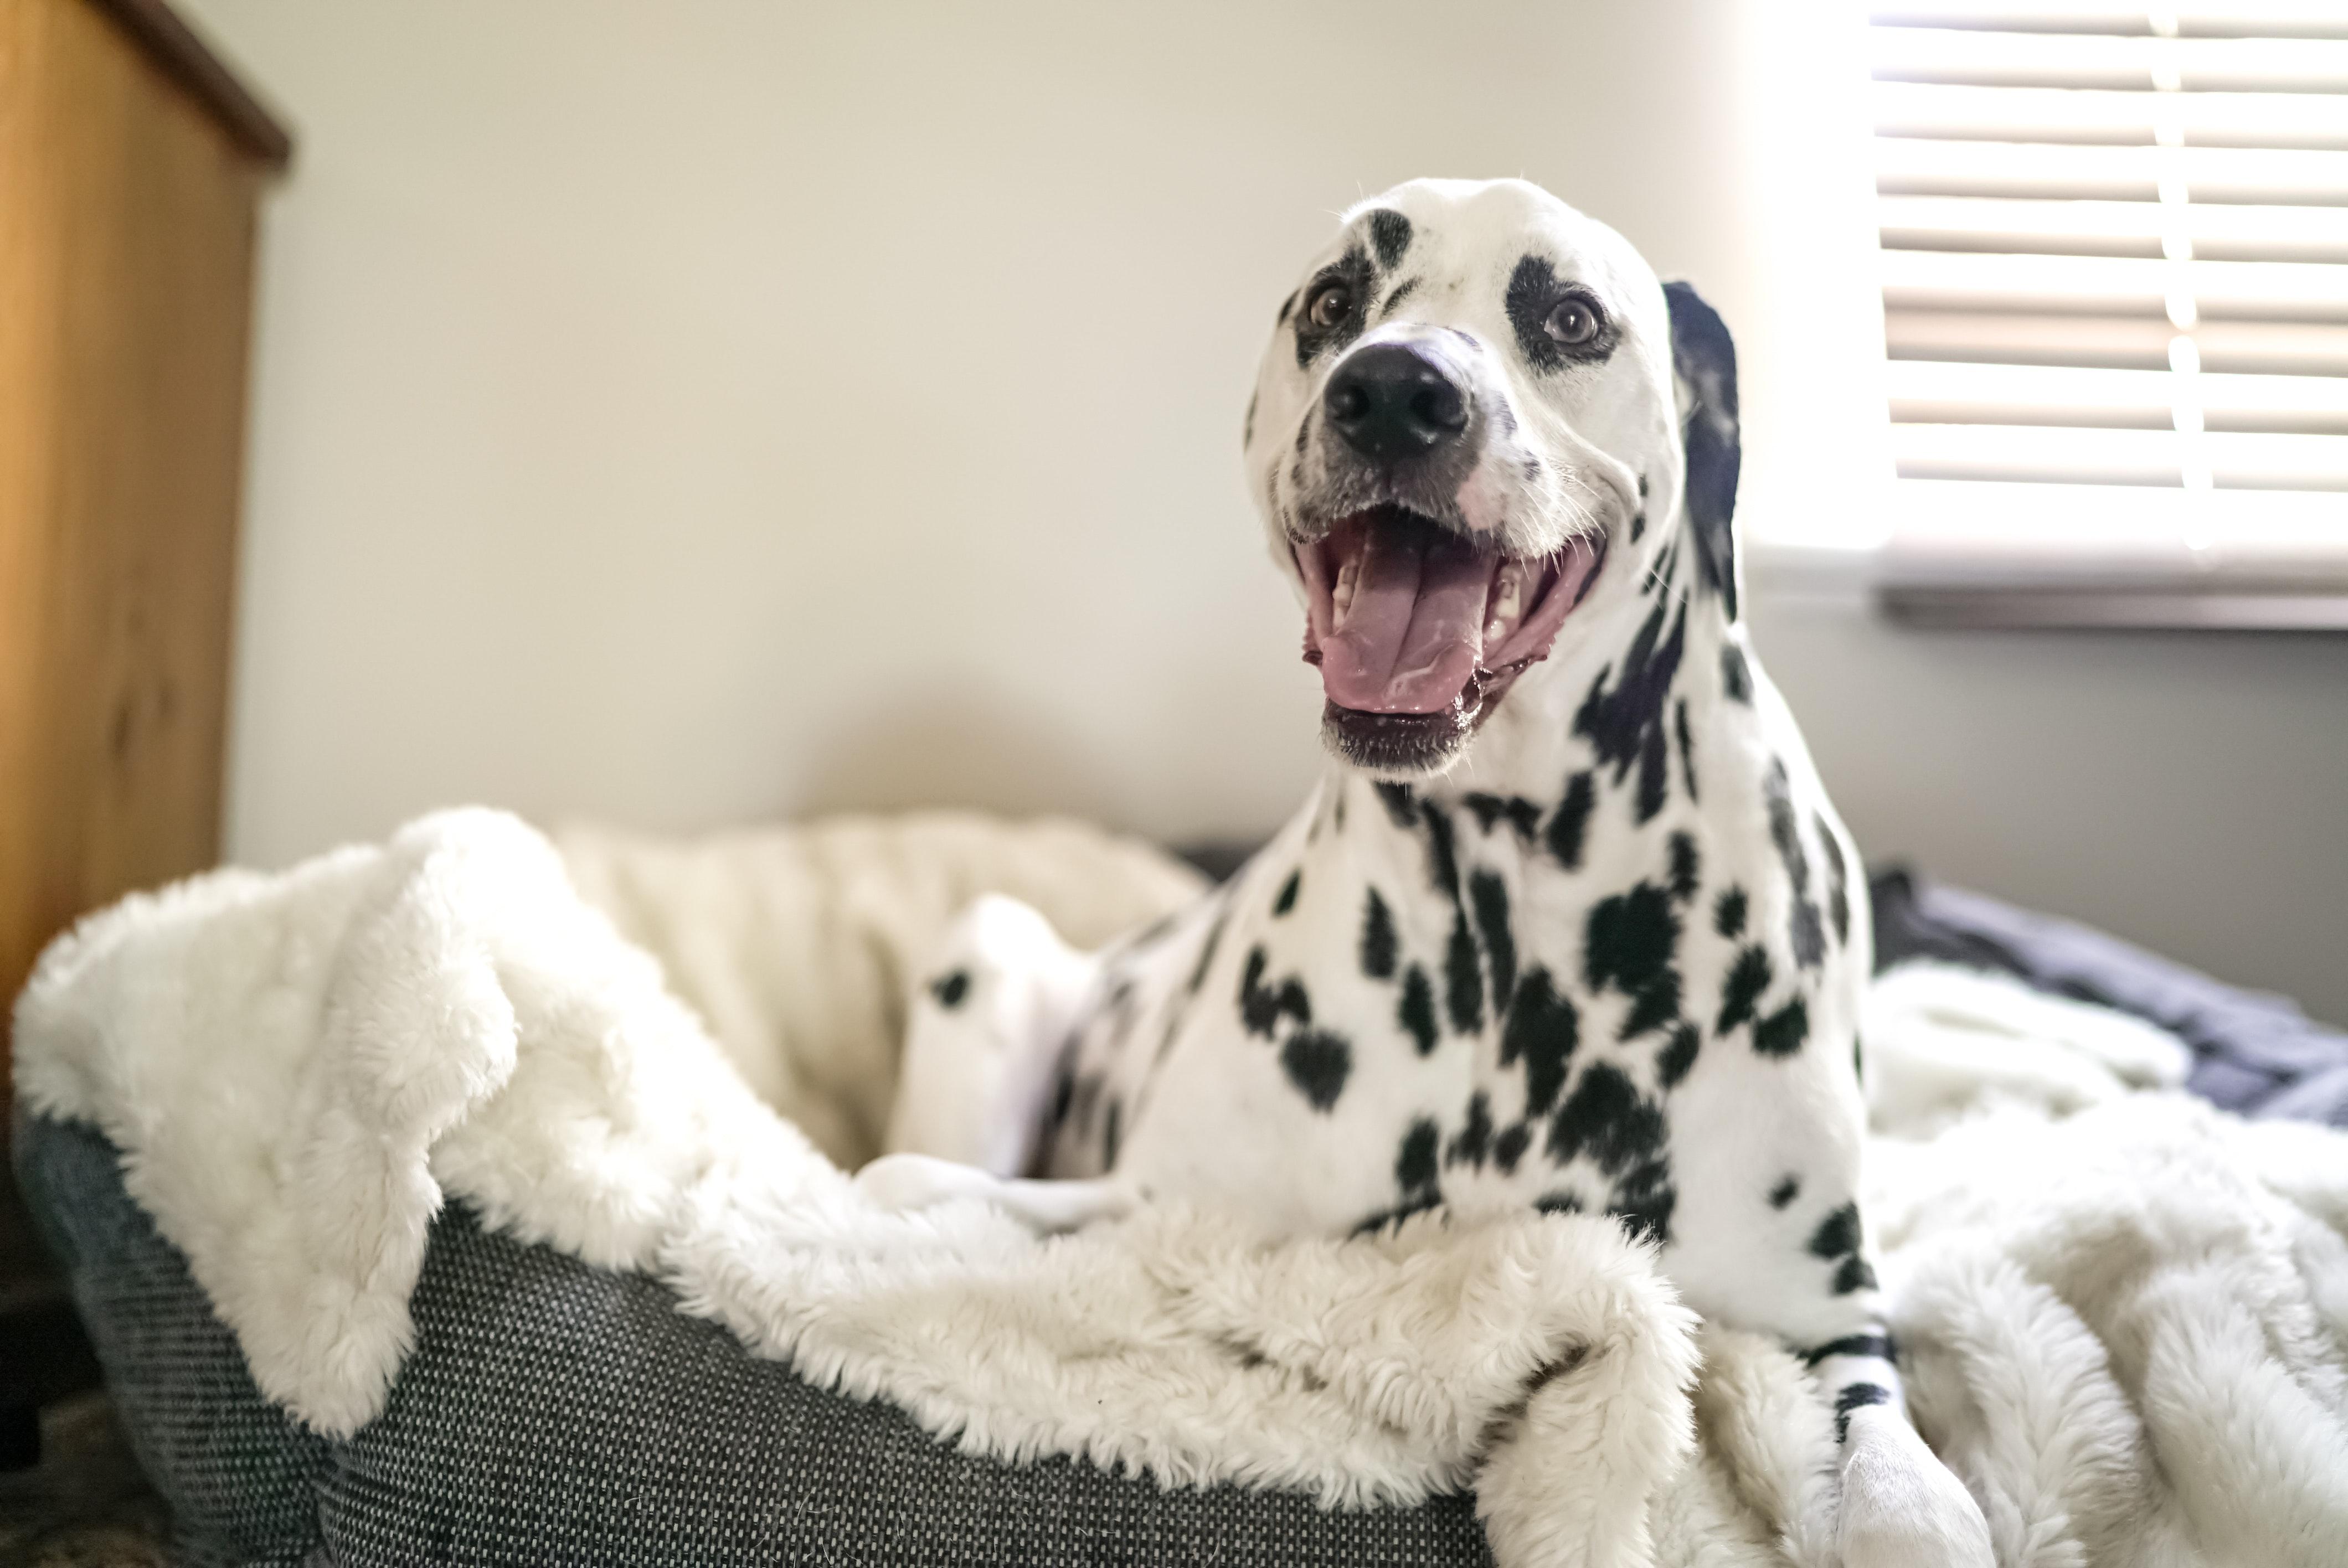 dalmatian lying in bed smiling